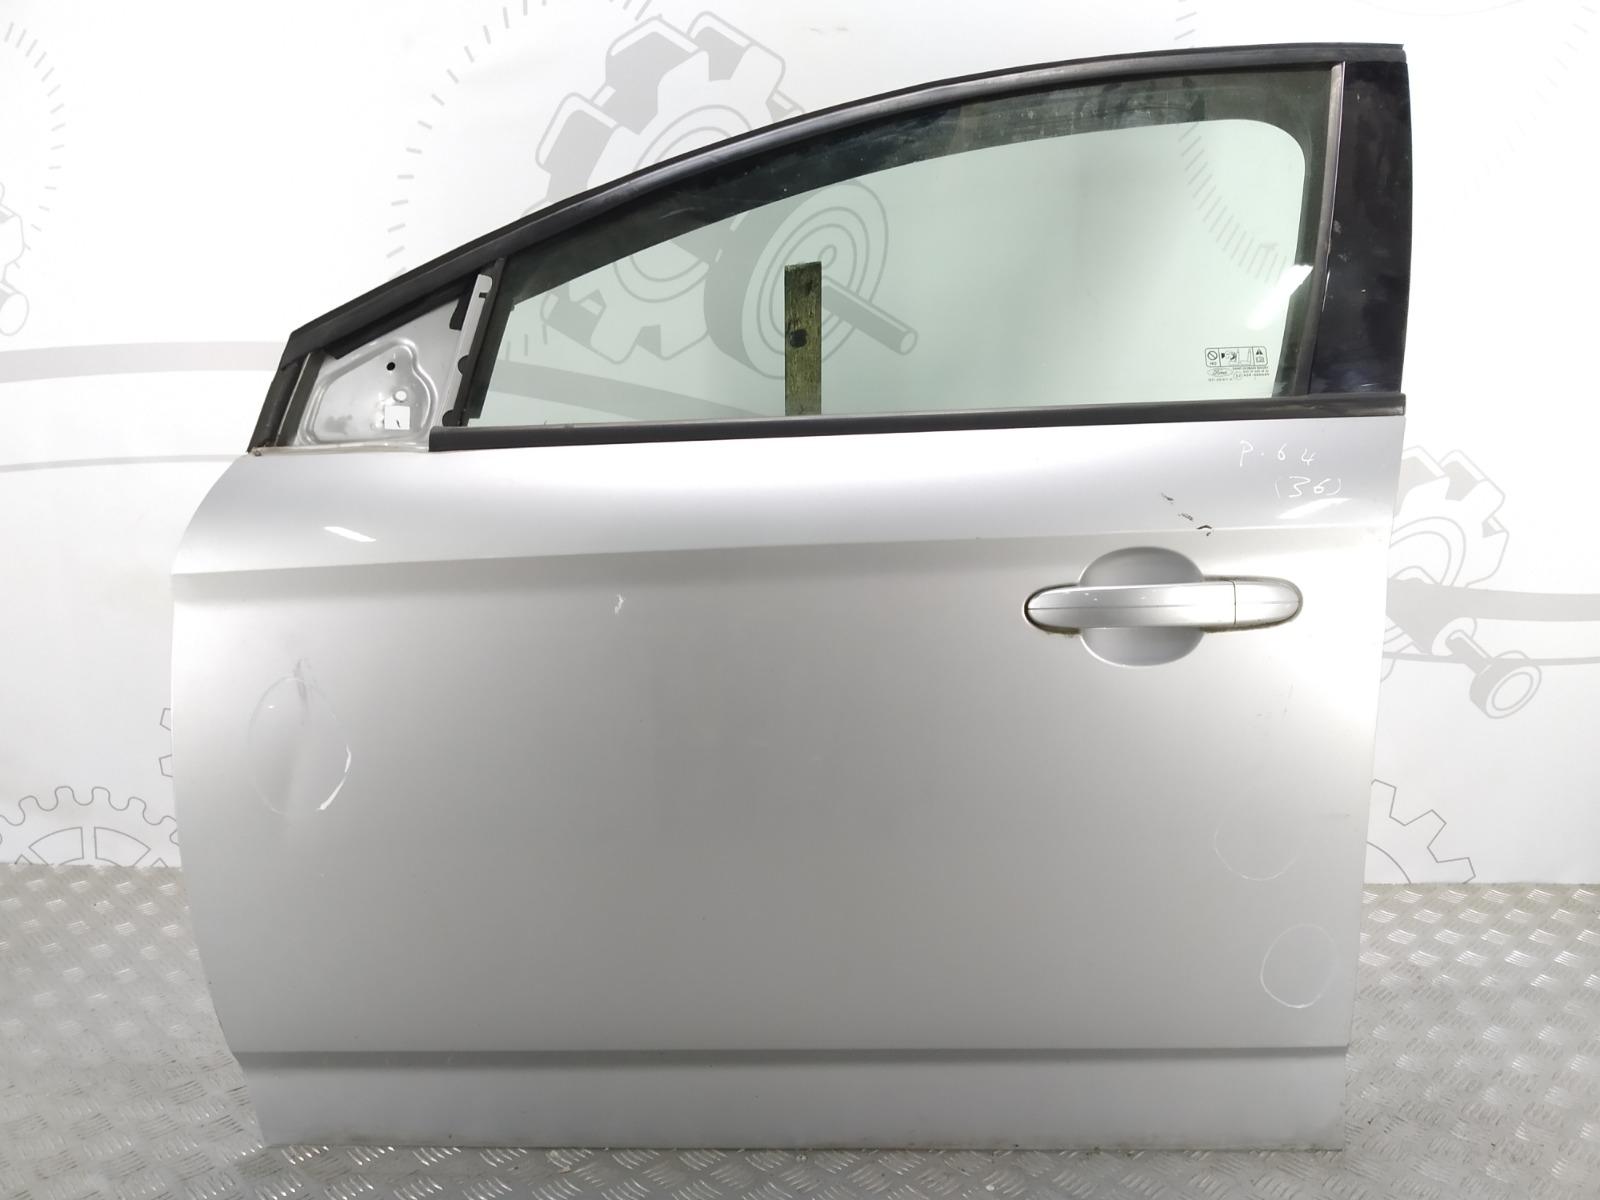 Дверь передняя левая Ford Mondeo 2.0 TDCI 2007 (б/у)